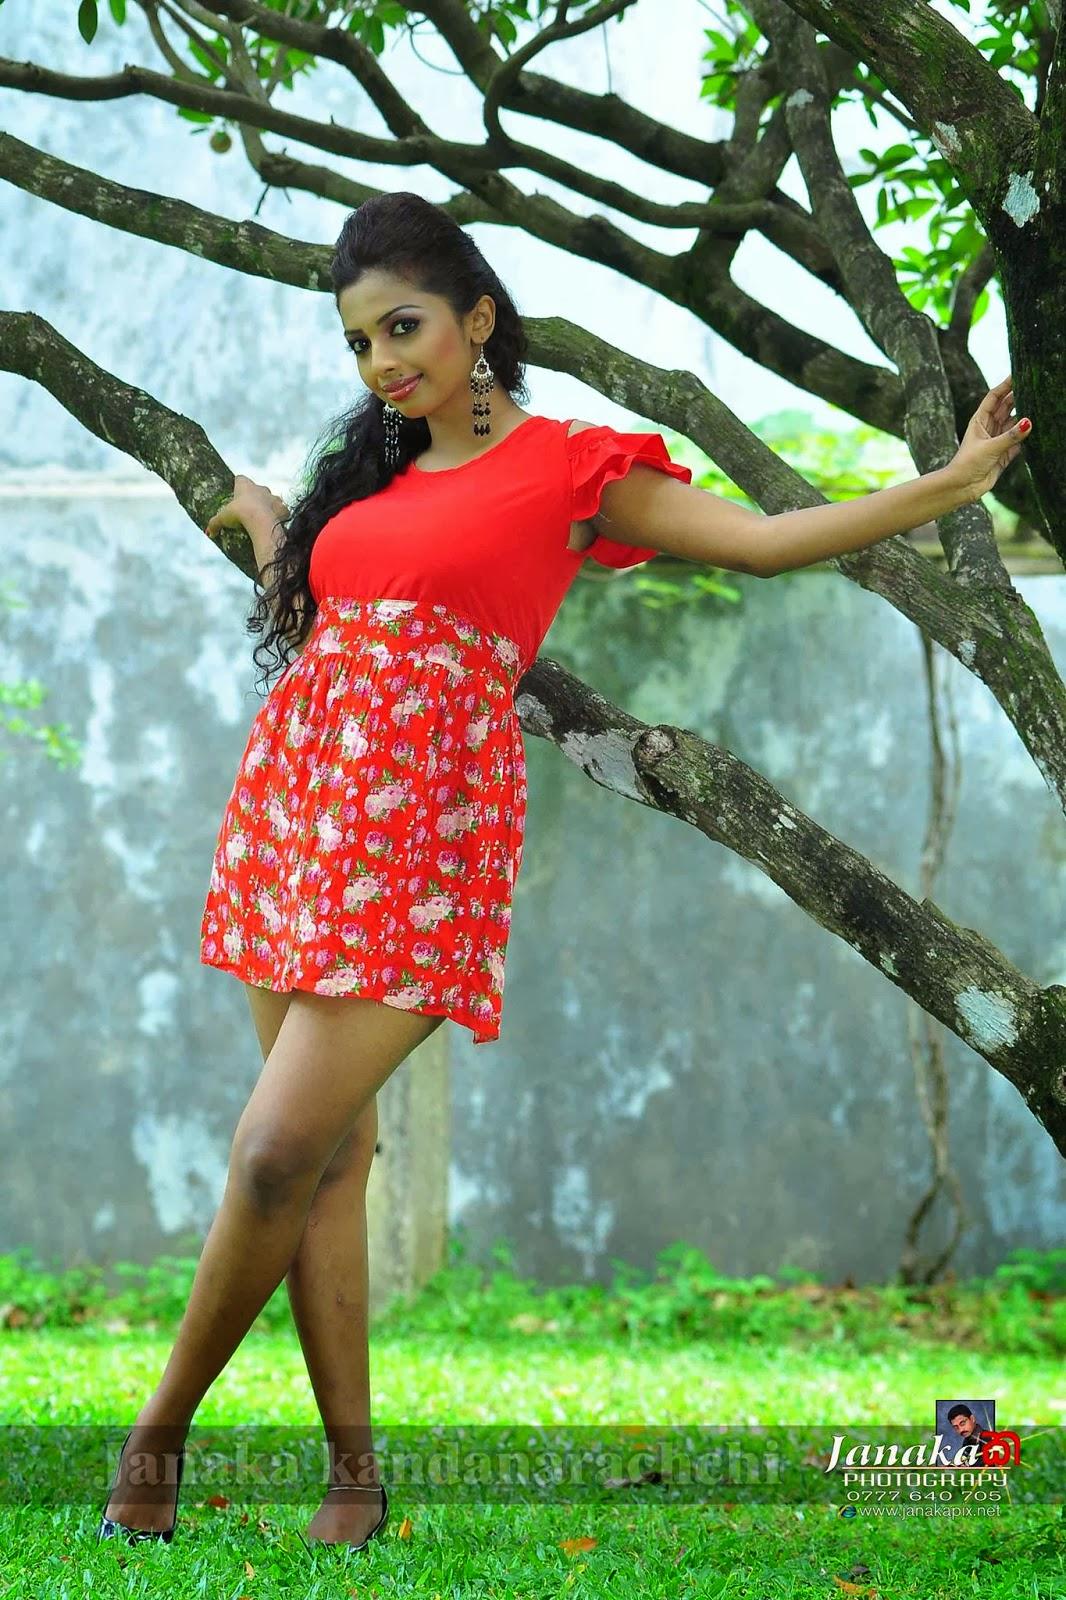 Lakshika Jayawardhana red hot mini dress